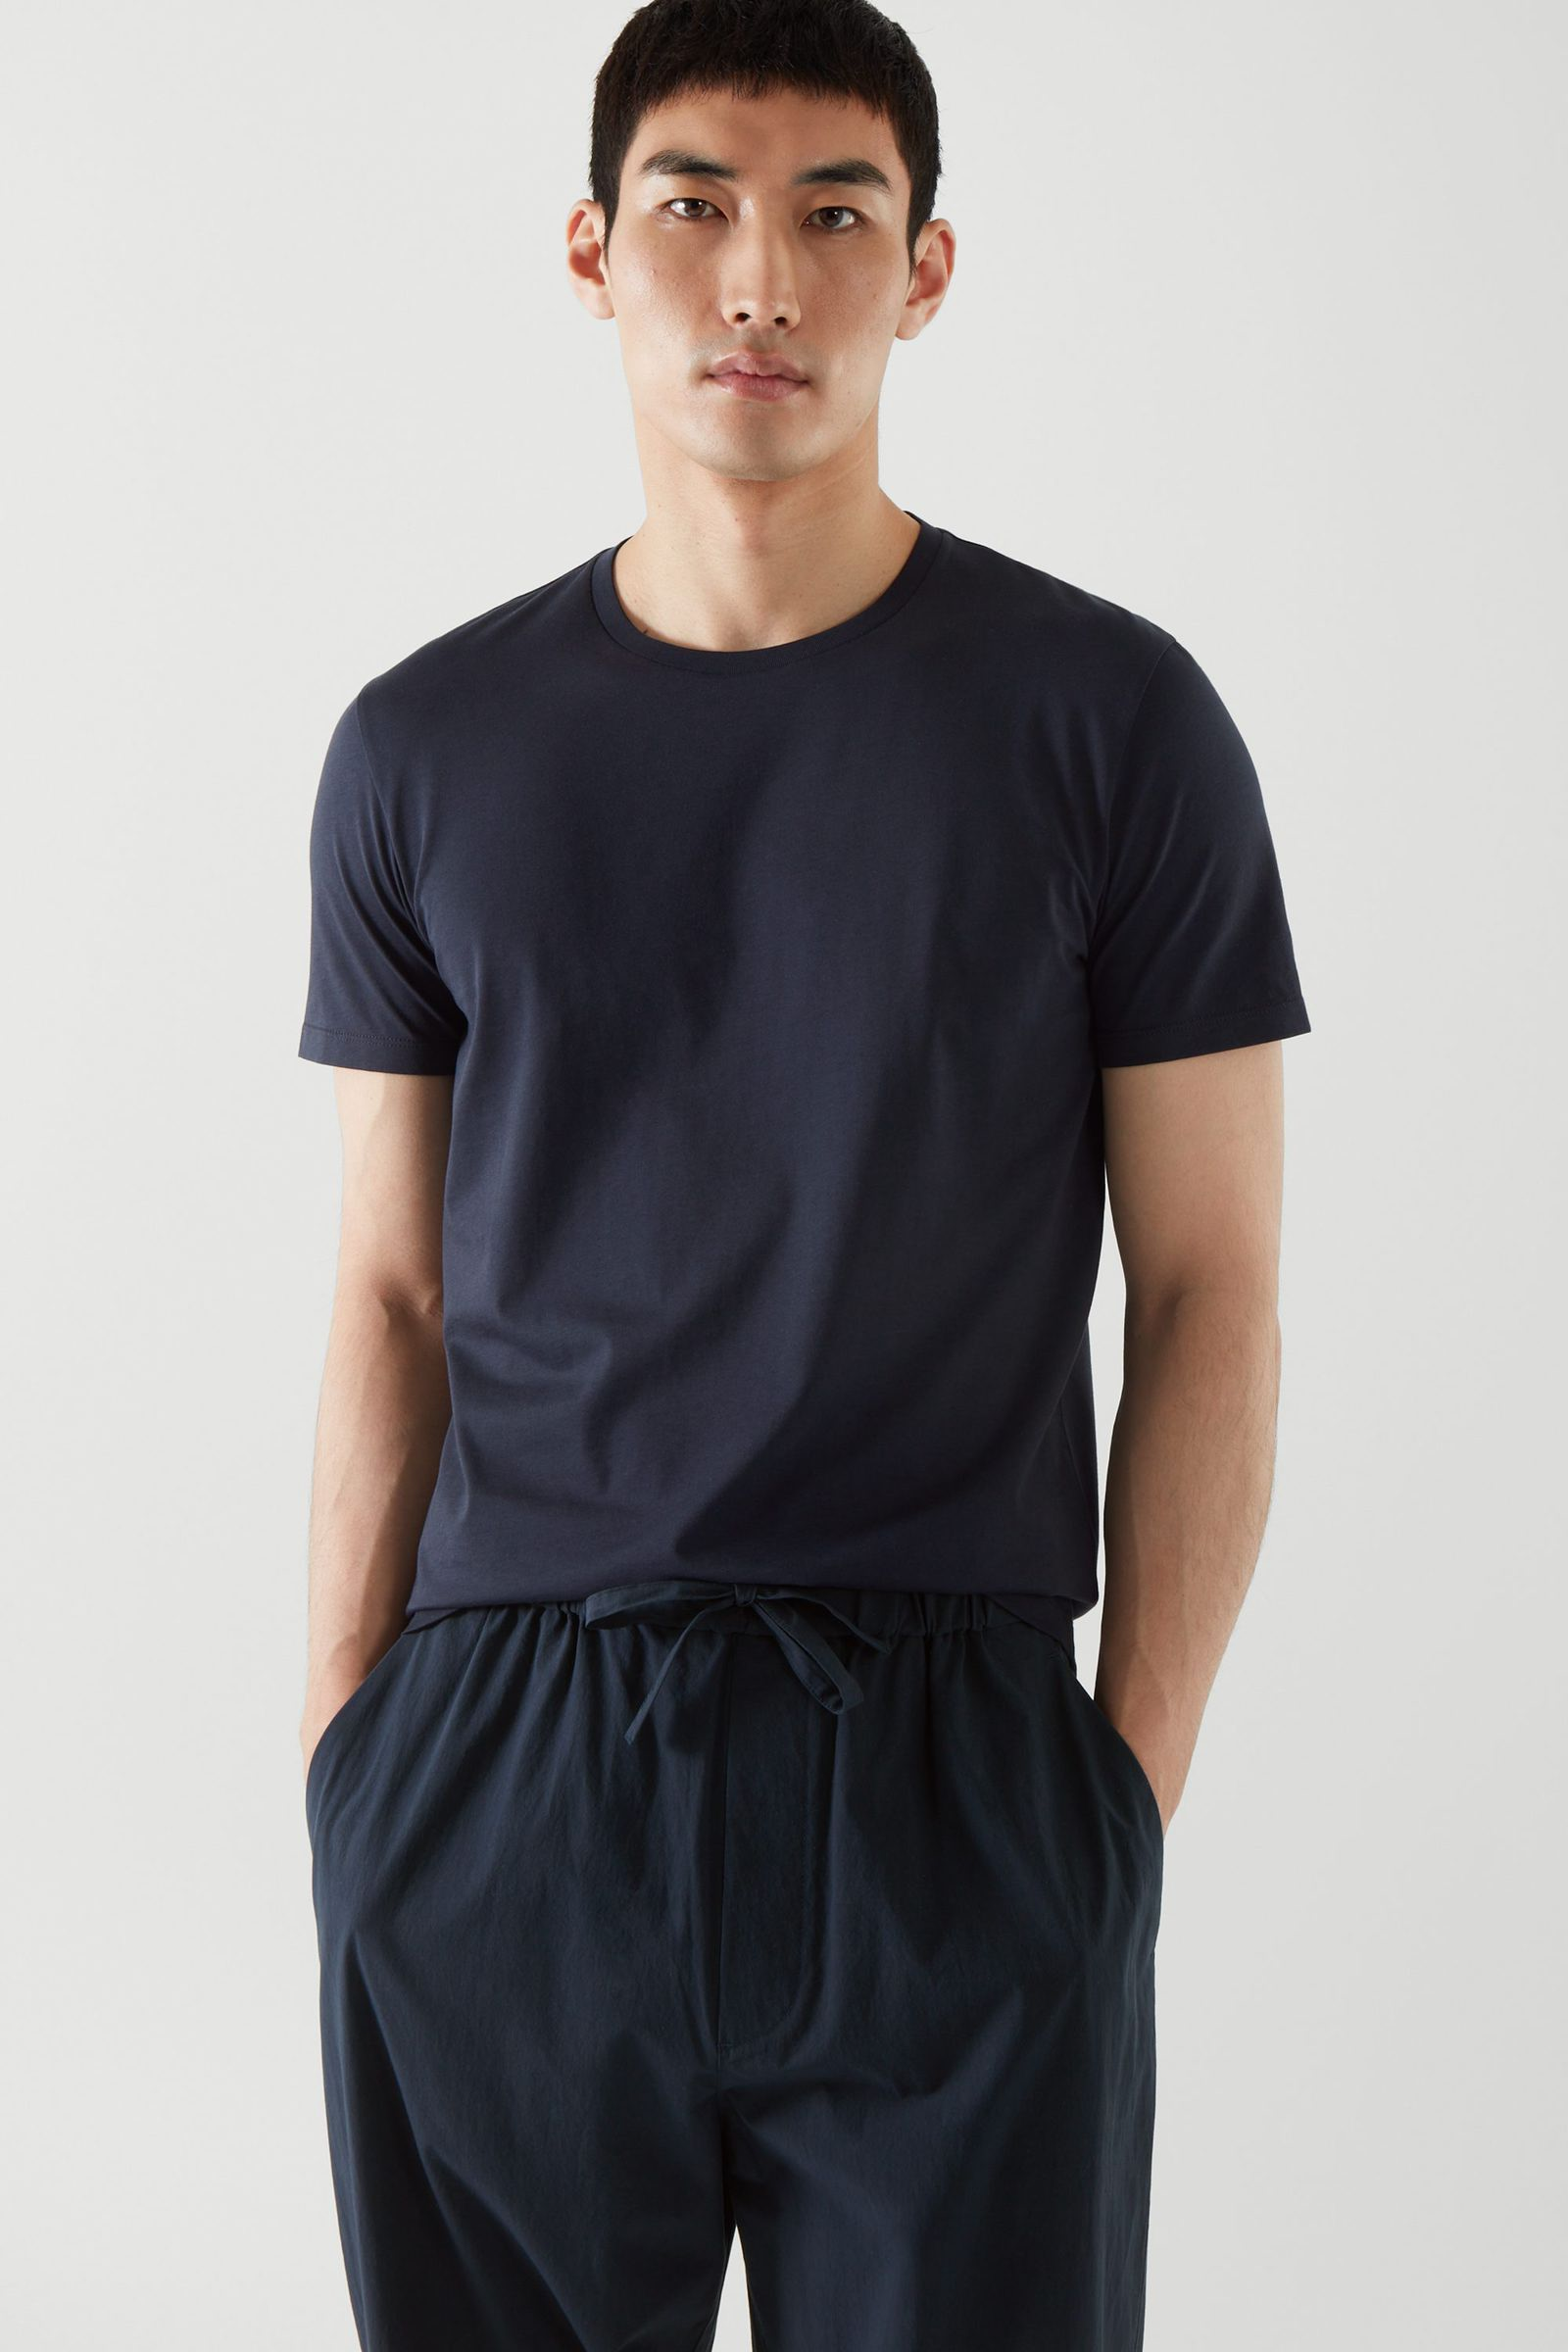 COS 레귤러 핏 티셔츠의 미드나이트 블루컬러 ECOMLook입니다.